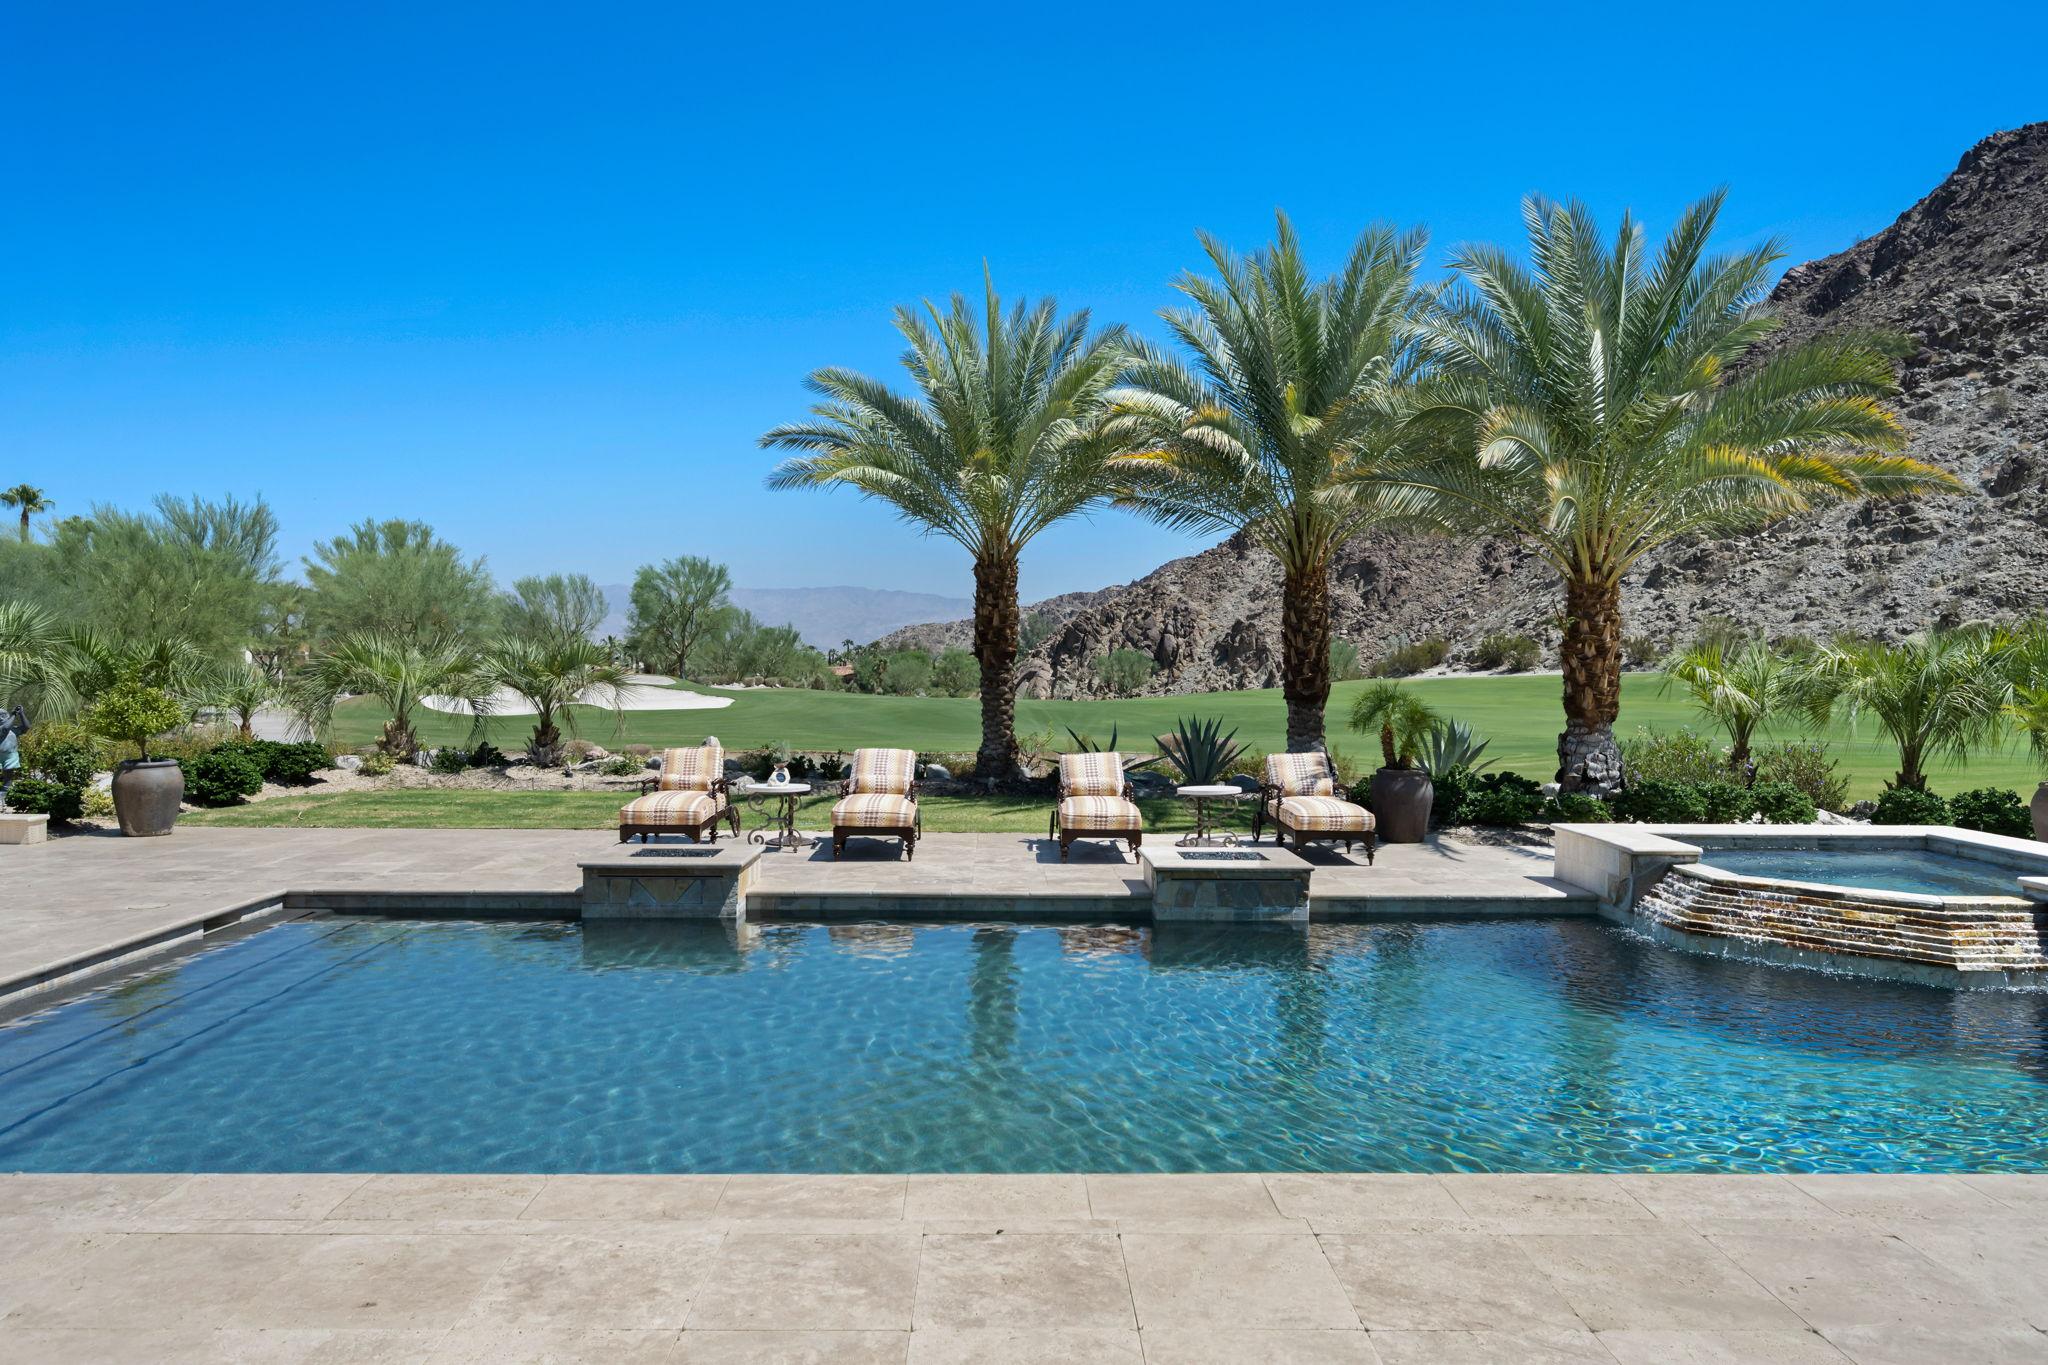 52845 La Trobe Ln, La Quinta, CA 92253, USA Photo 32